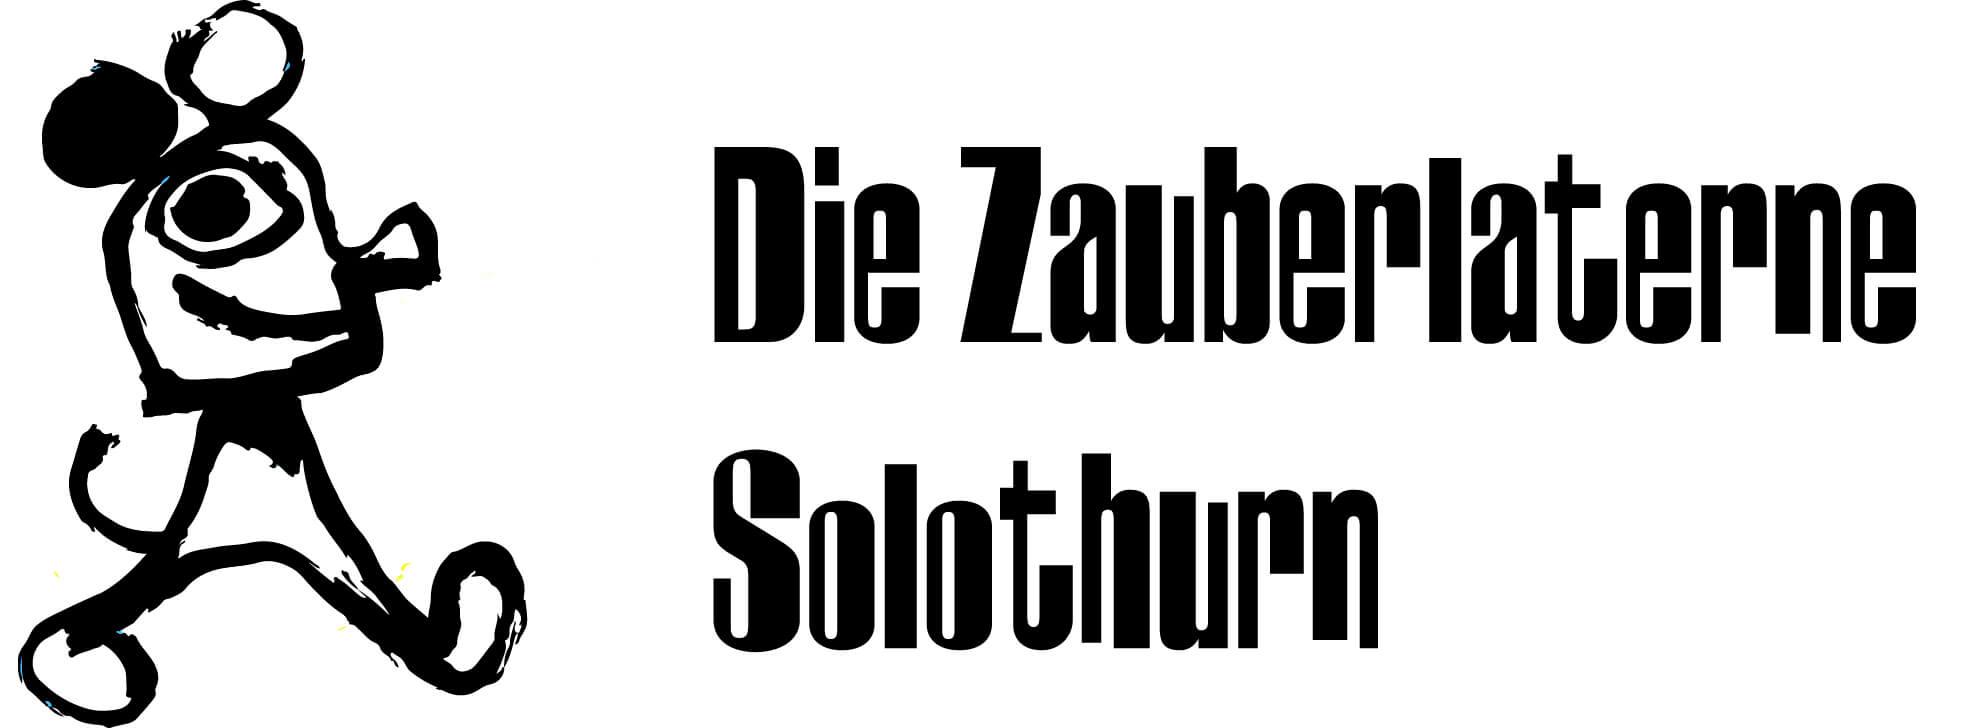 Zauberlaterne Solothurn – Kino für Kinder